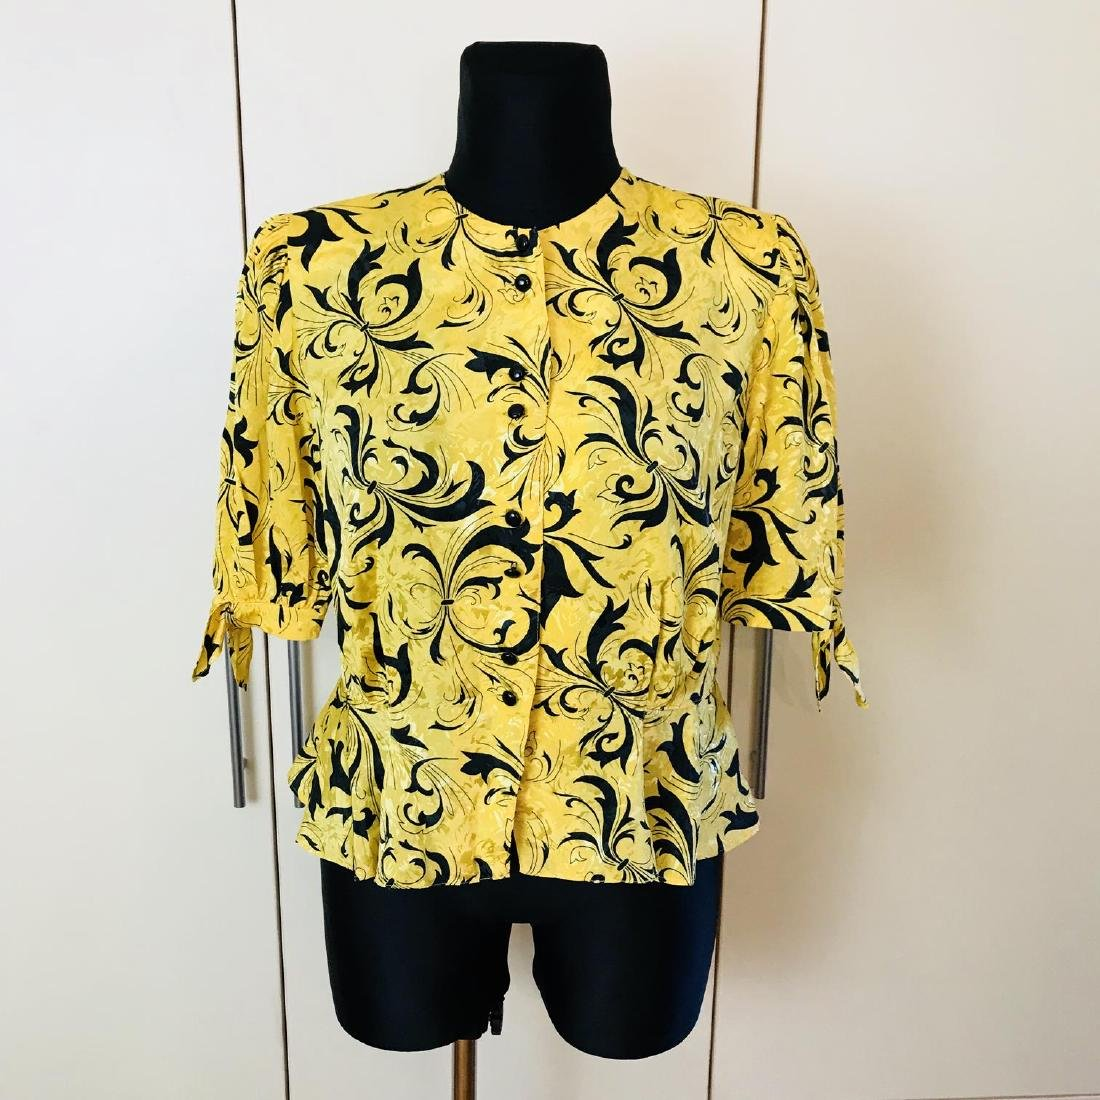 Vintage Women's Yellow Blouse Shirt Top Size EUR 46 US